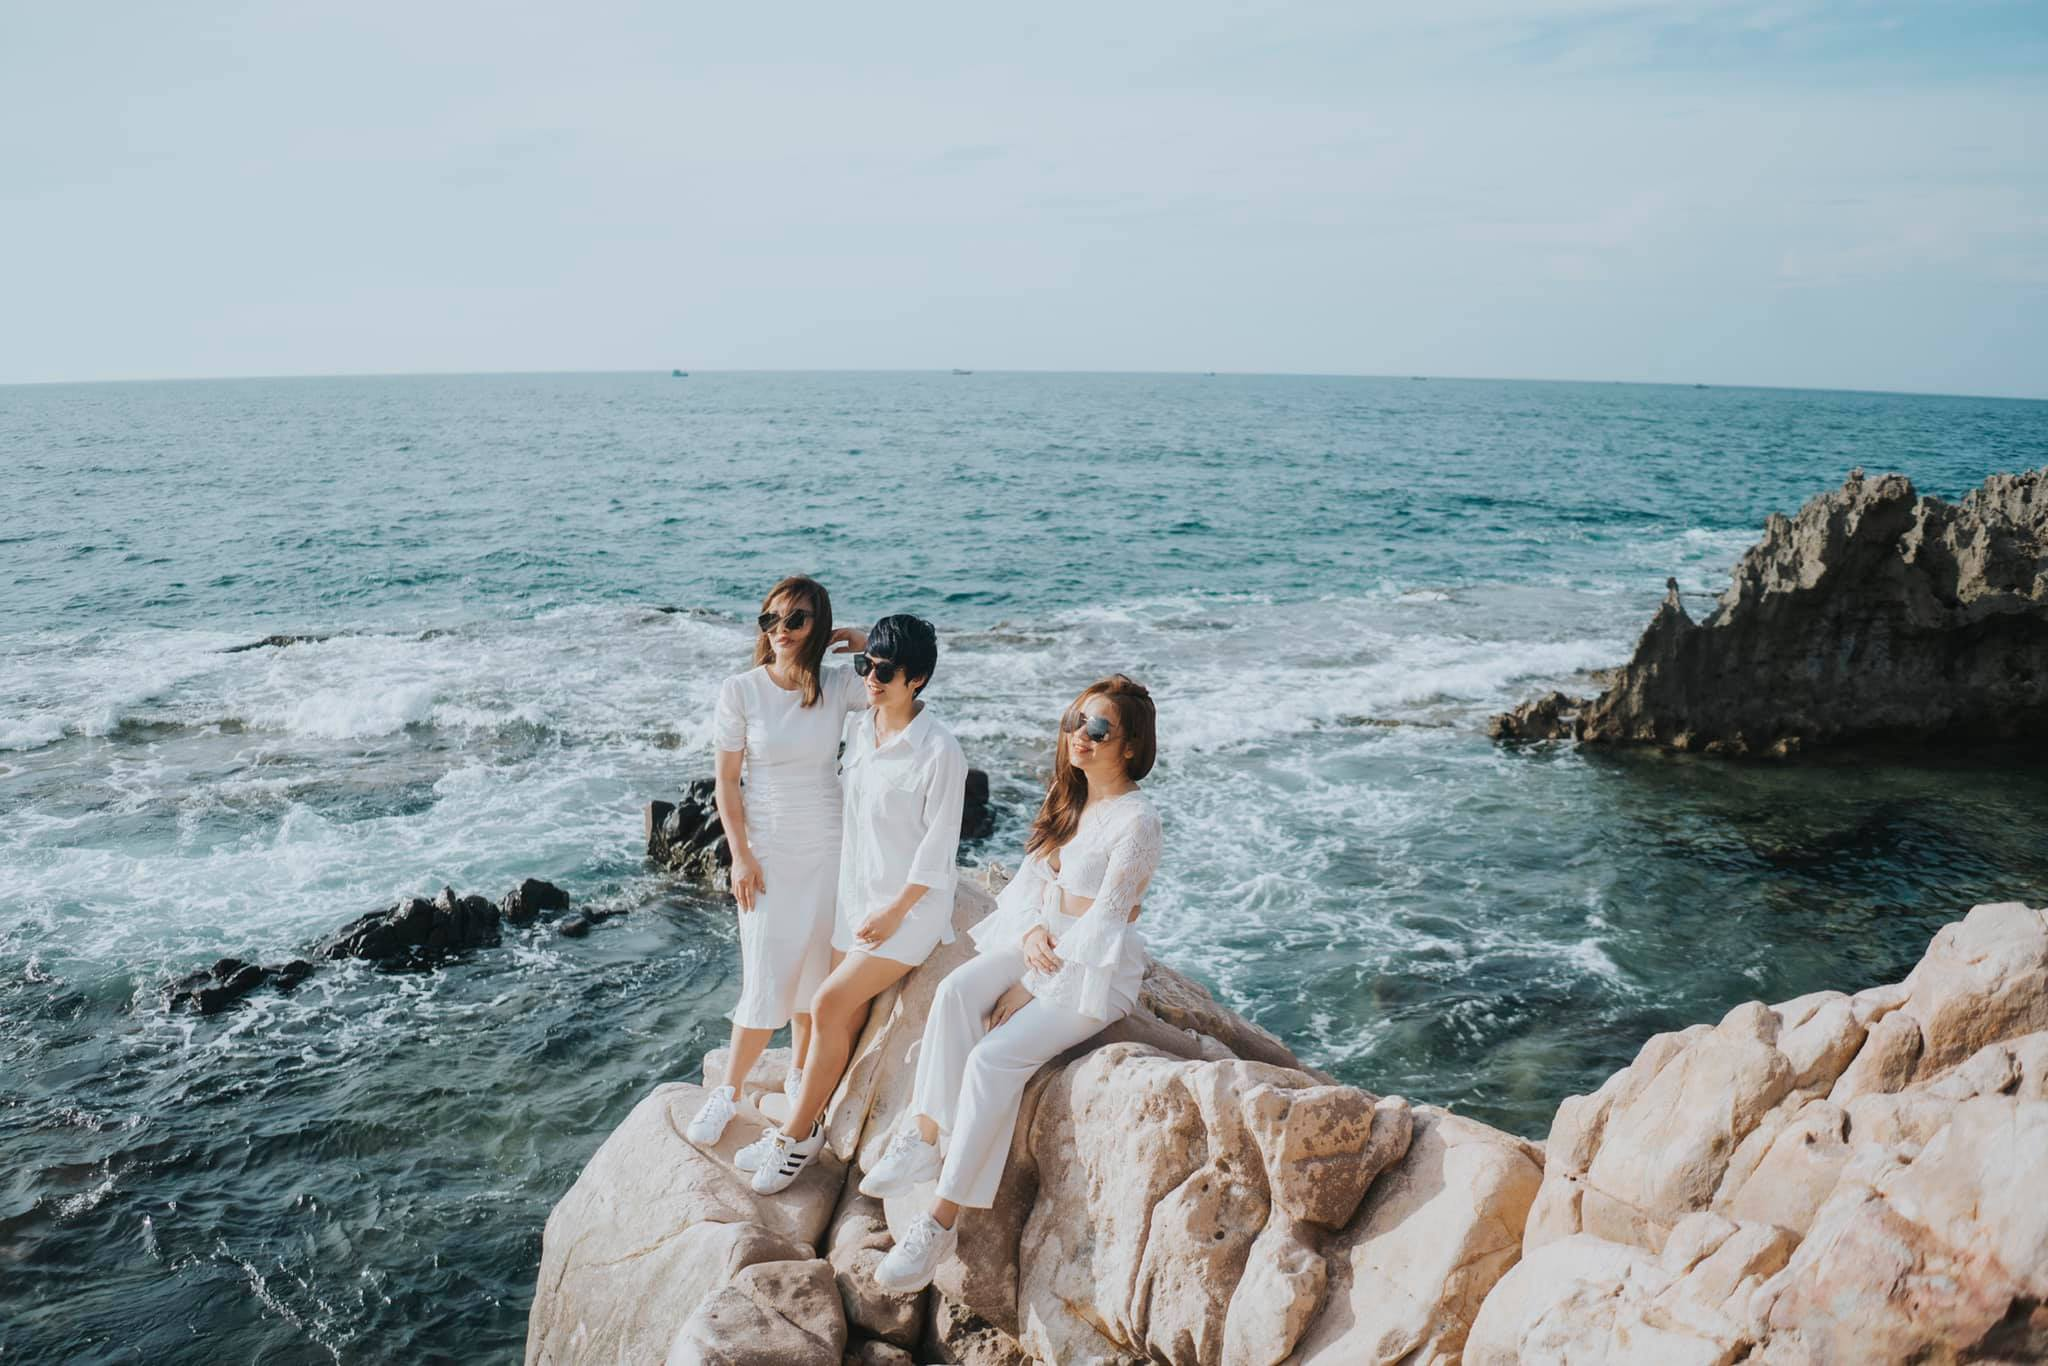 Top-10-bai-bien-dep-nhat-viet-nam-vietmountain-travel5